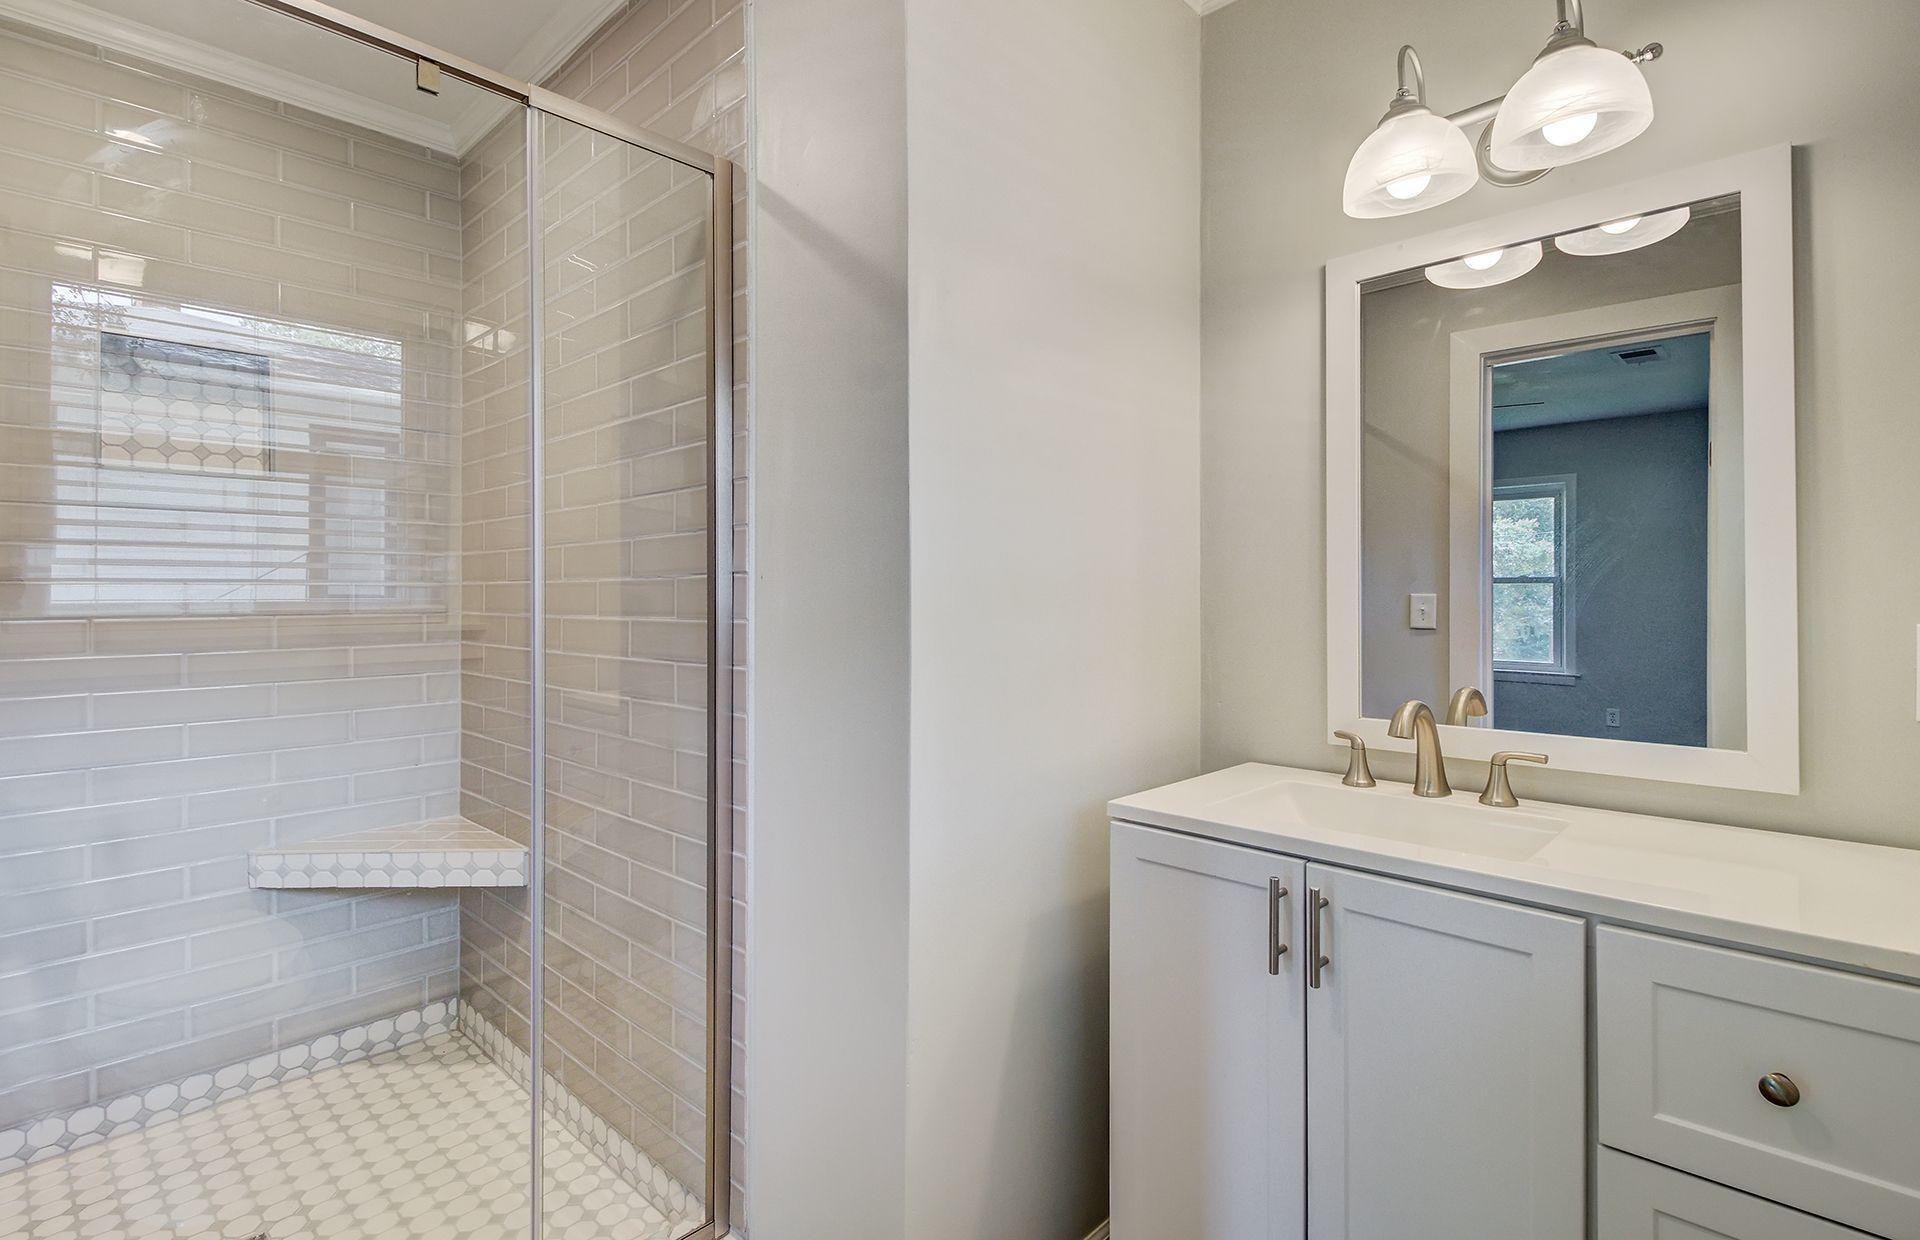 Belvedere Estates Homes For Sale - 6010 Ridgecrest, Hanahan, SC - 23